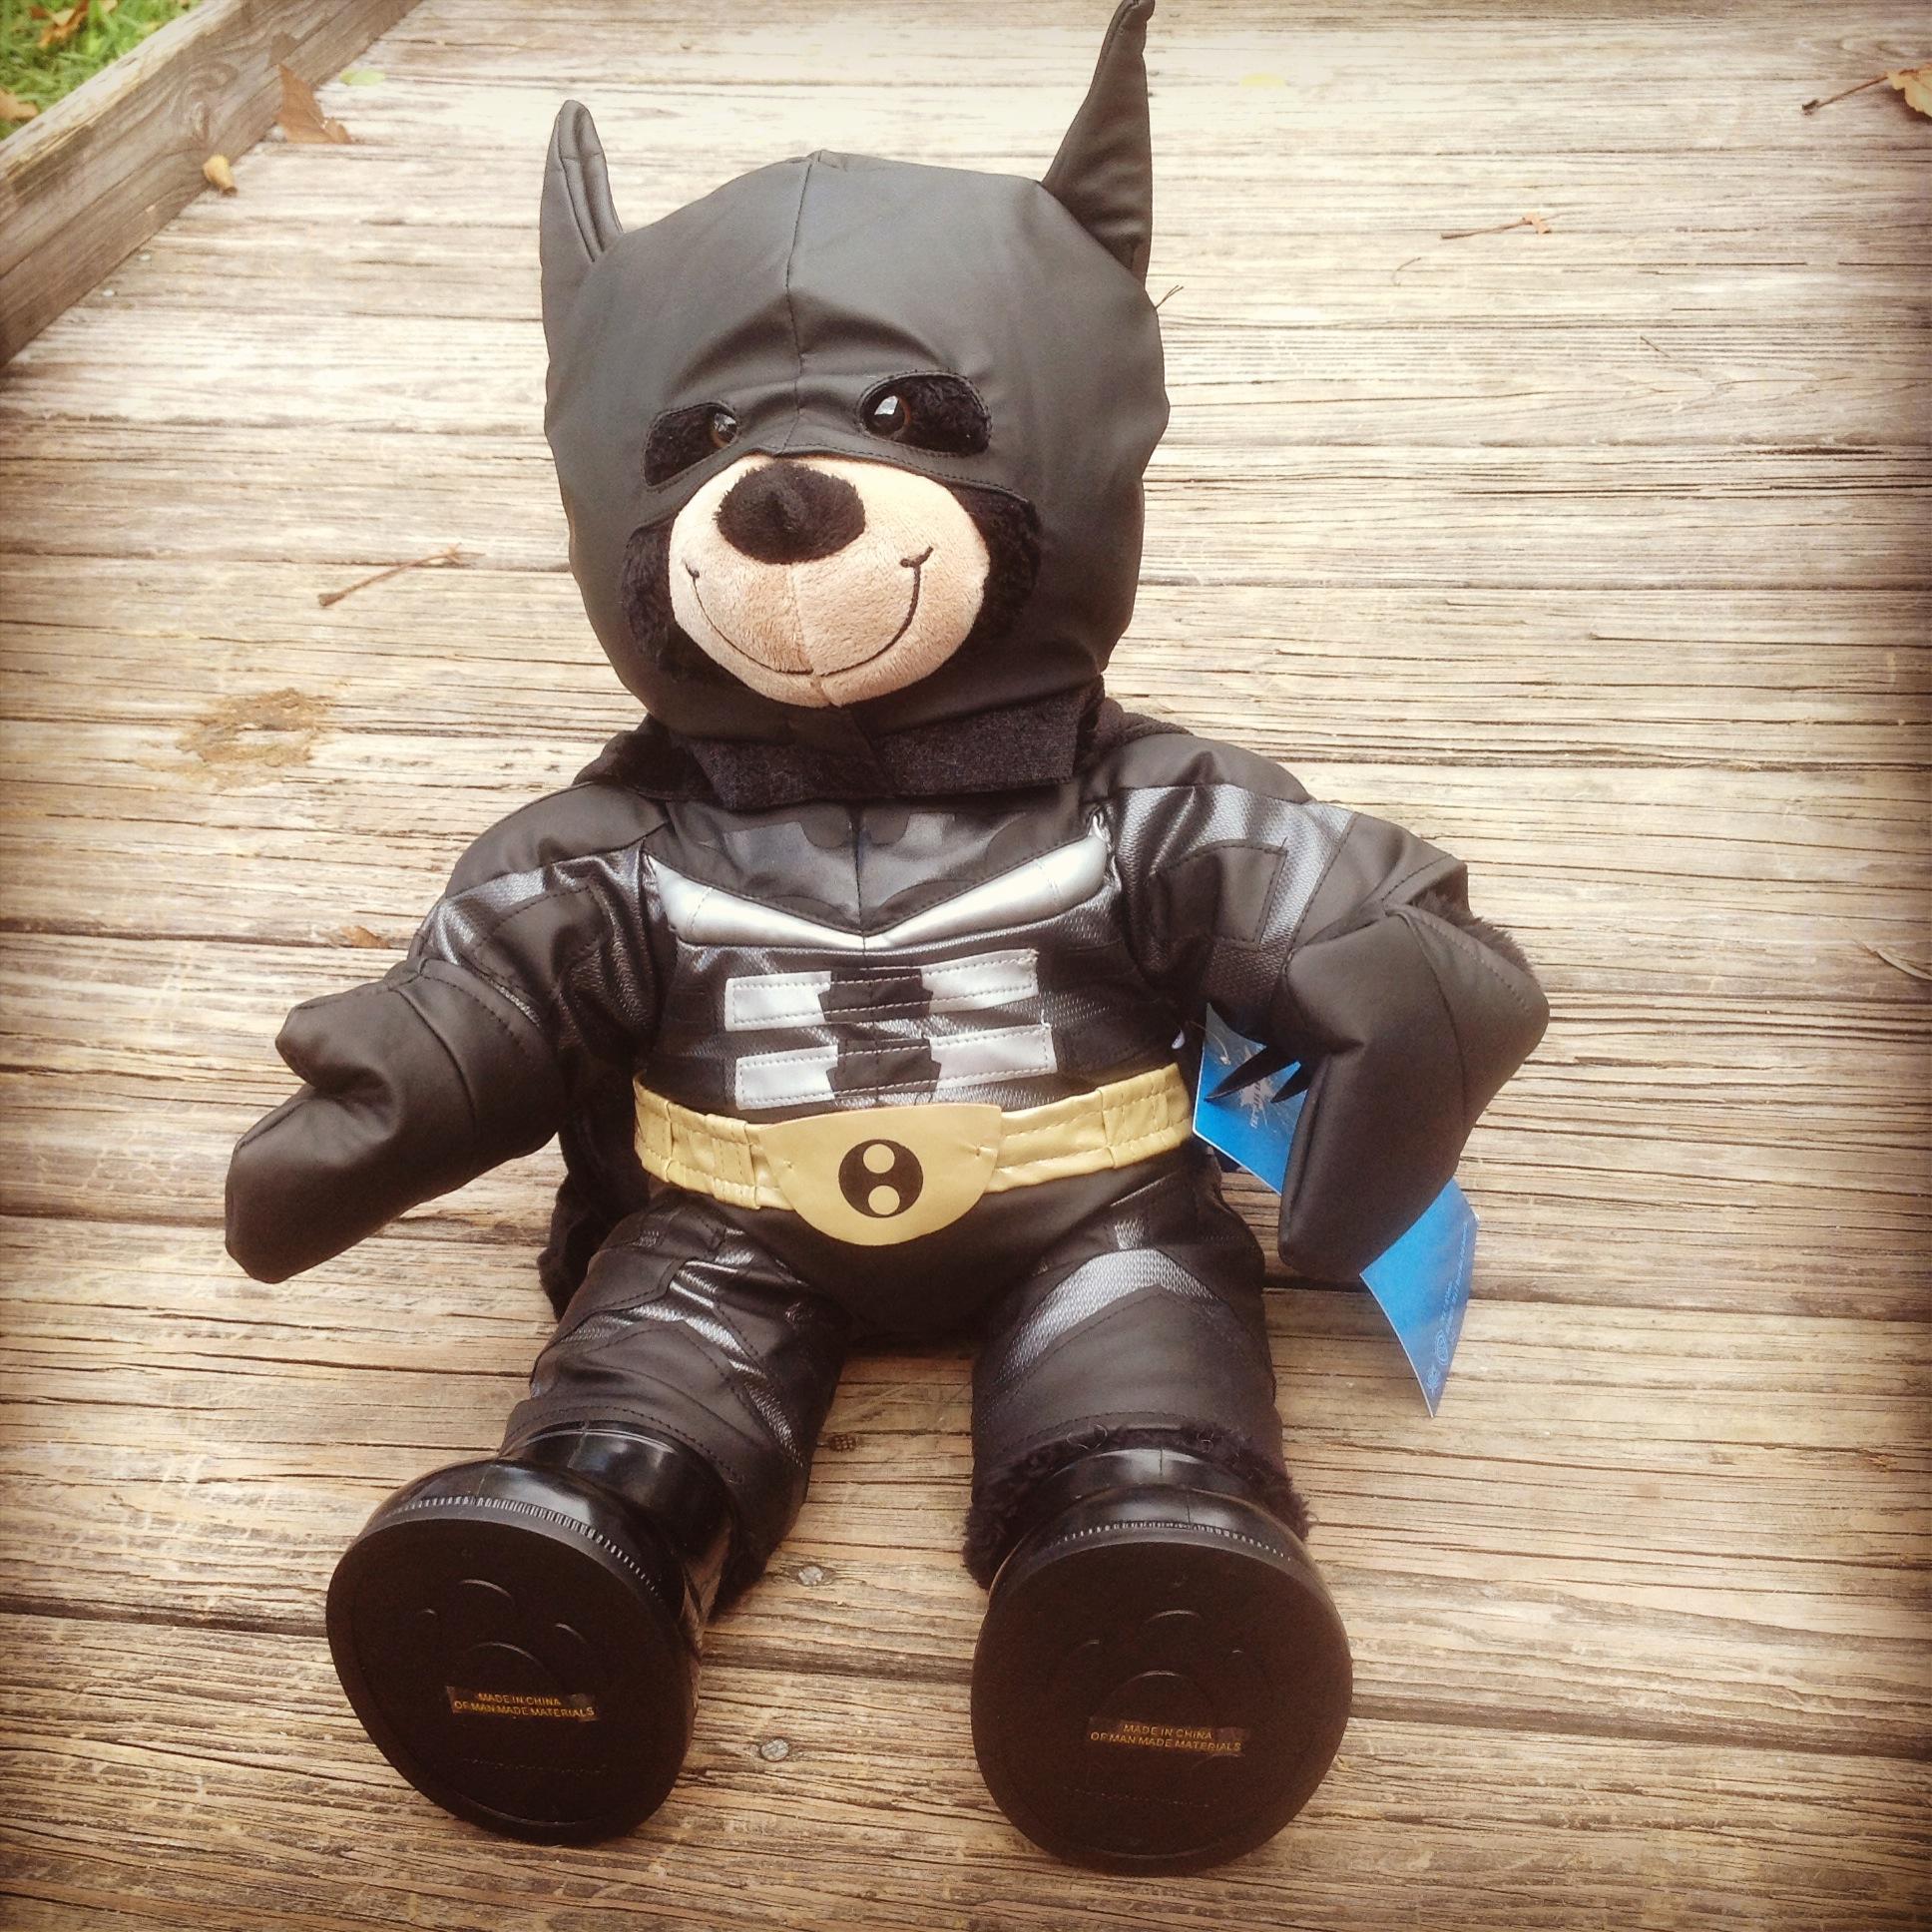 Batman Build-A-Bear